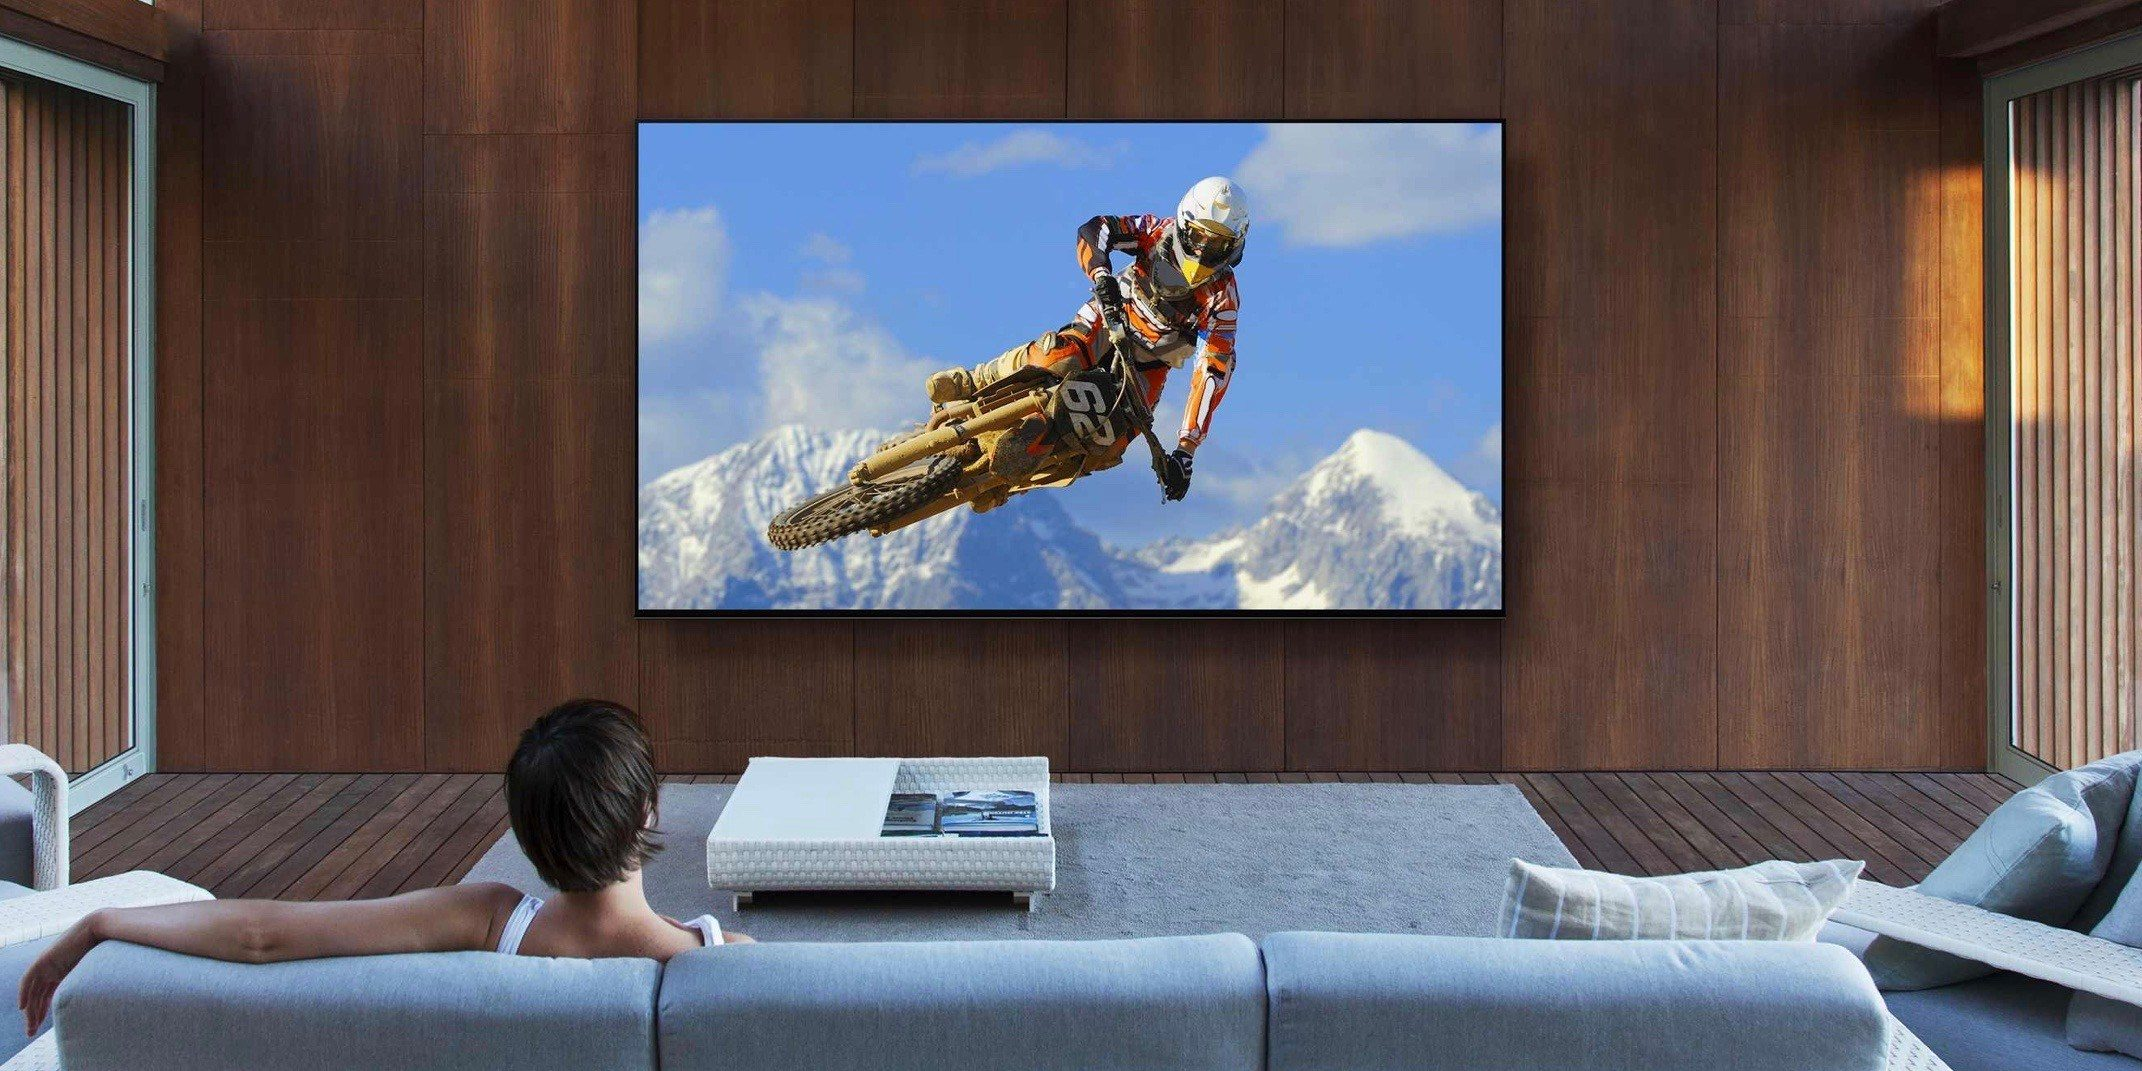 sony tvs airplay 2 homekit